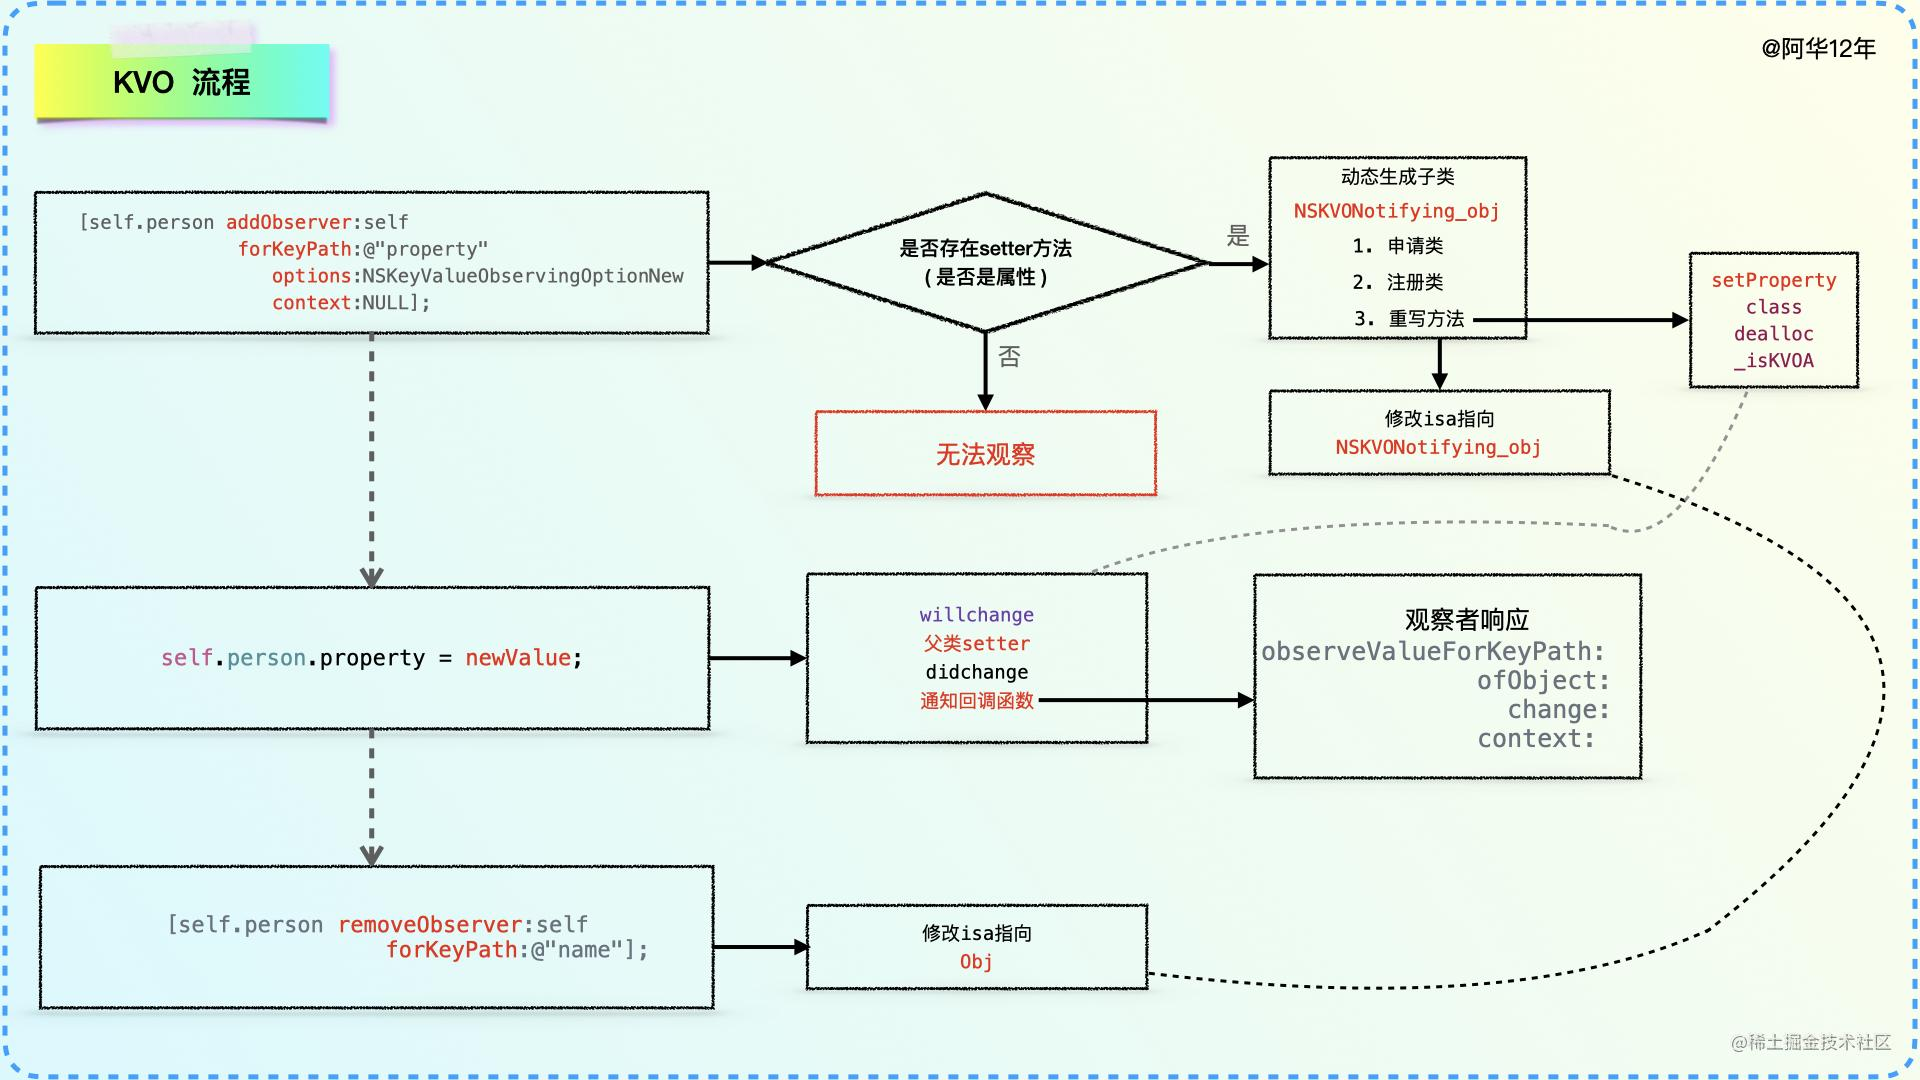 KVO流程.001.jpeg